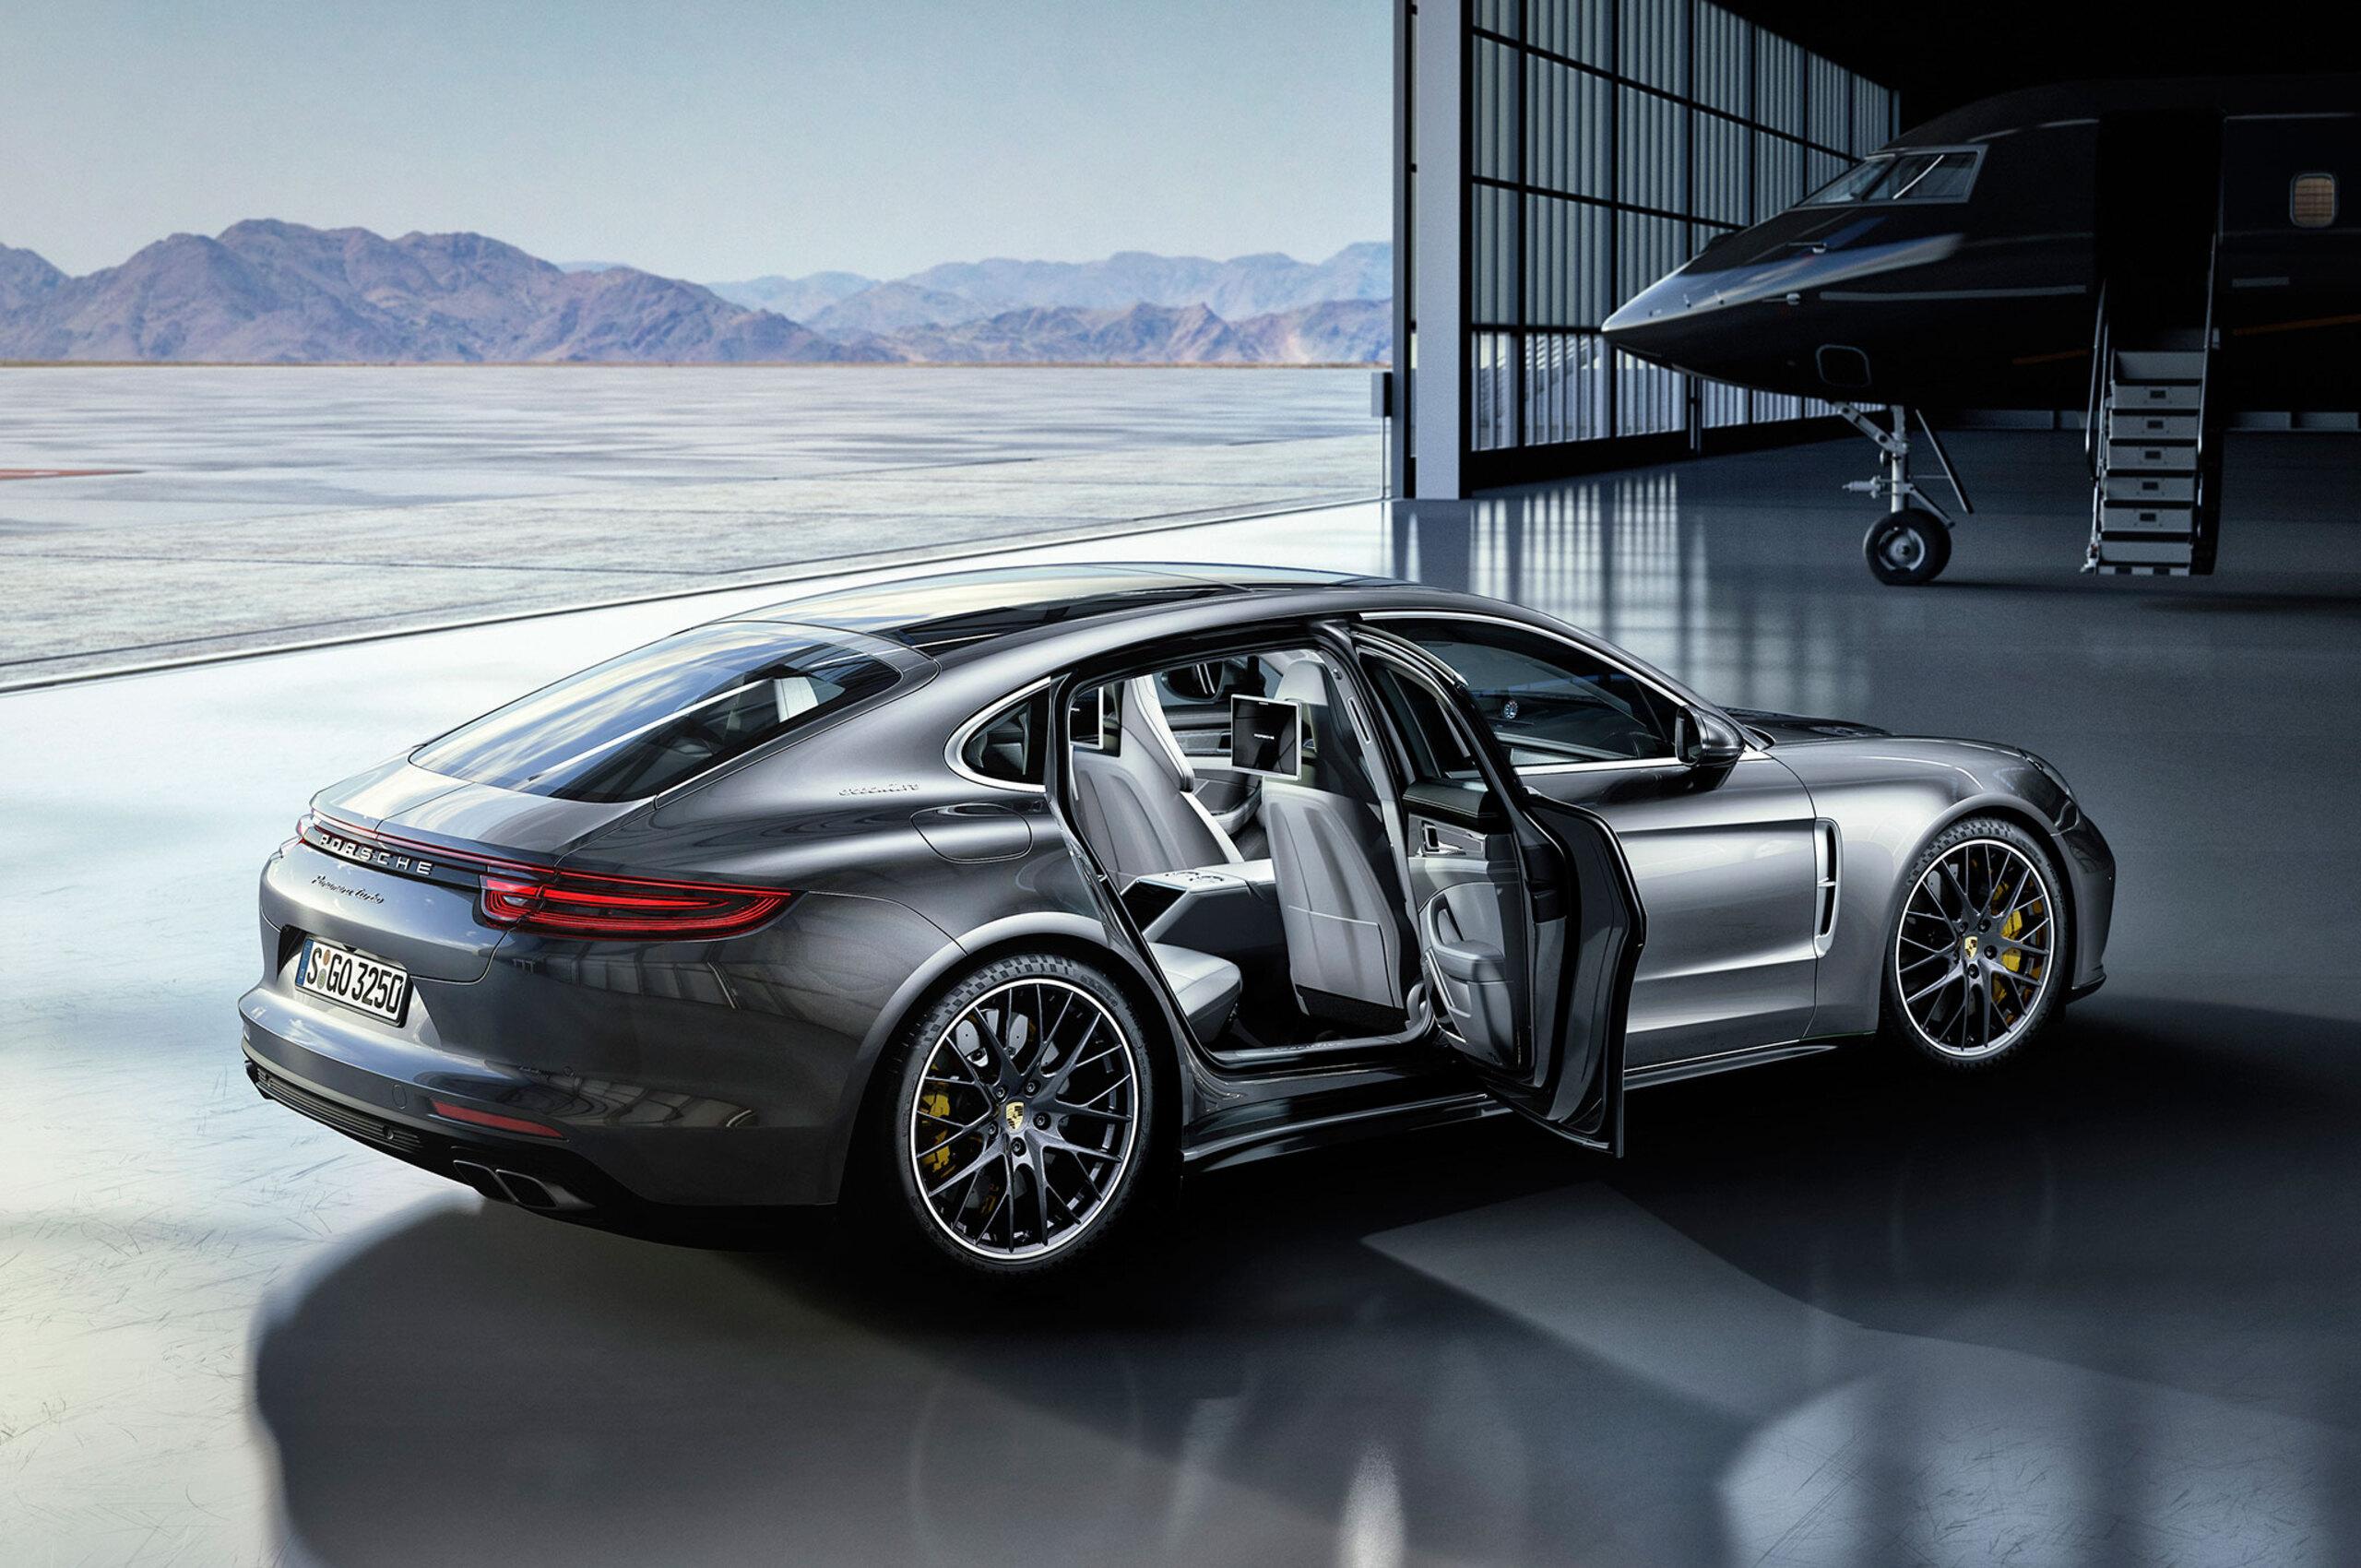 2017 Porsche Panamera Turbo Sd Jpg